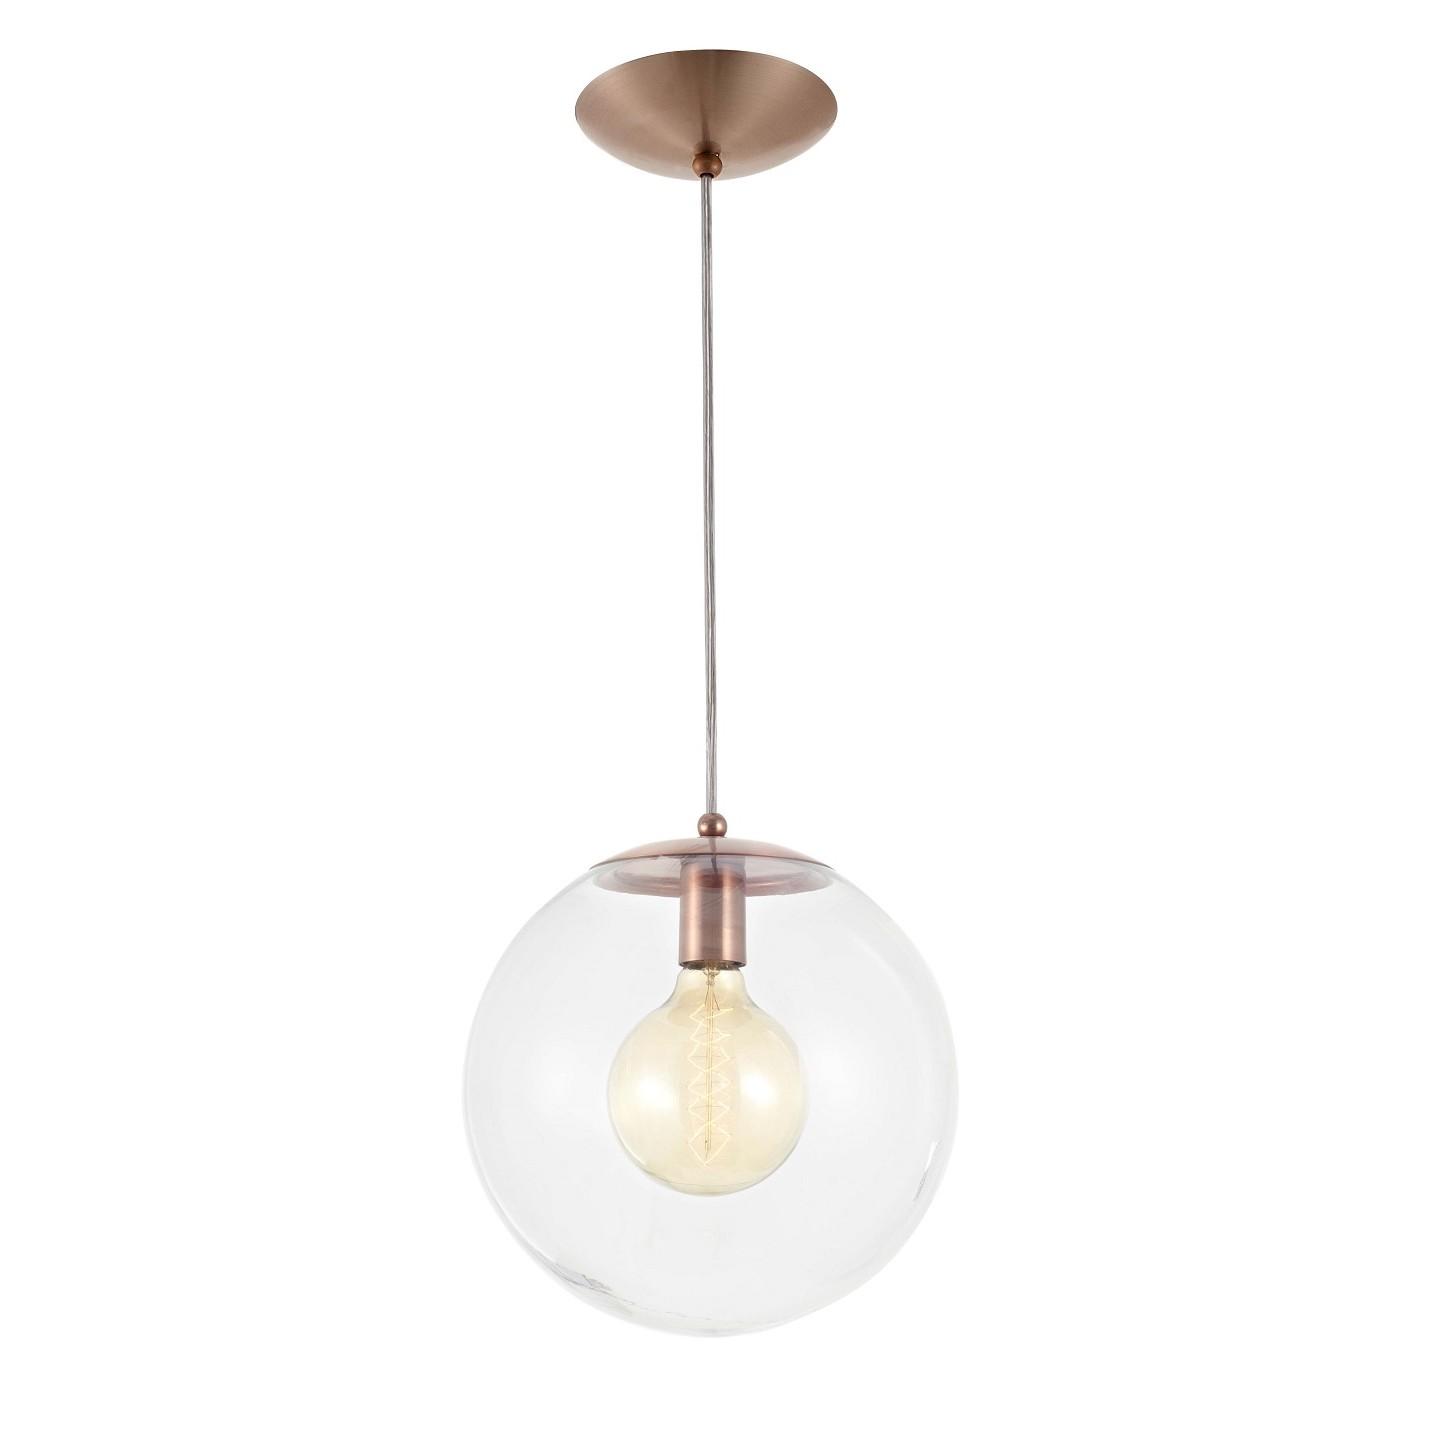 Pendente Esfera 20 cm 1 Lampada Cobre - Madelustre